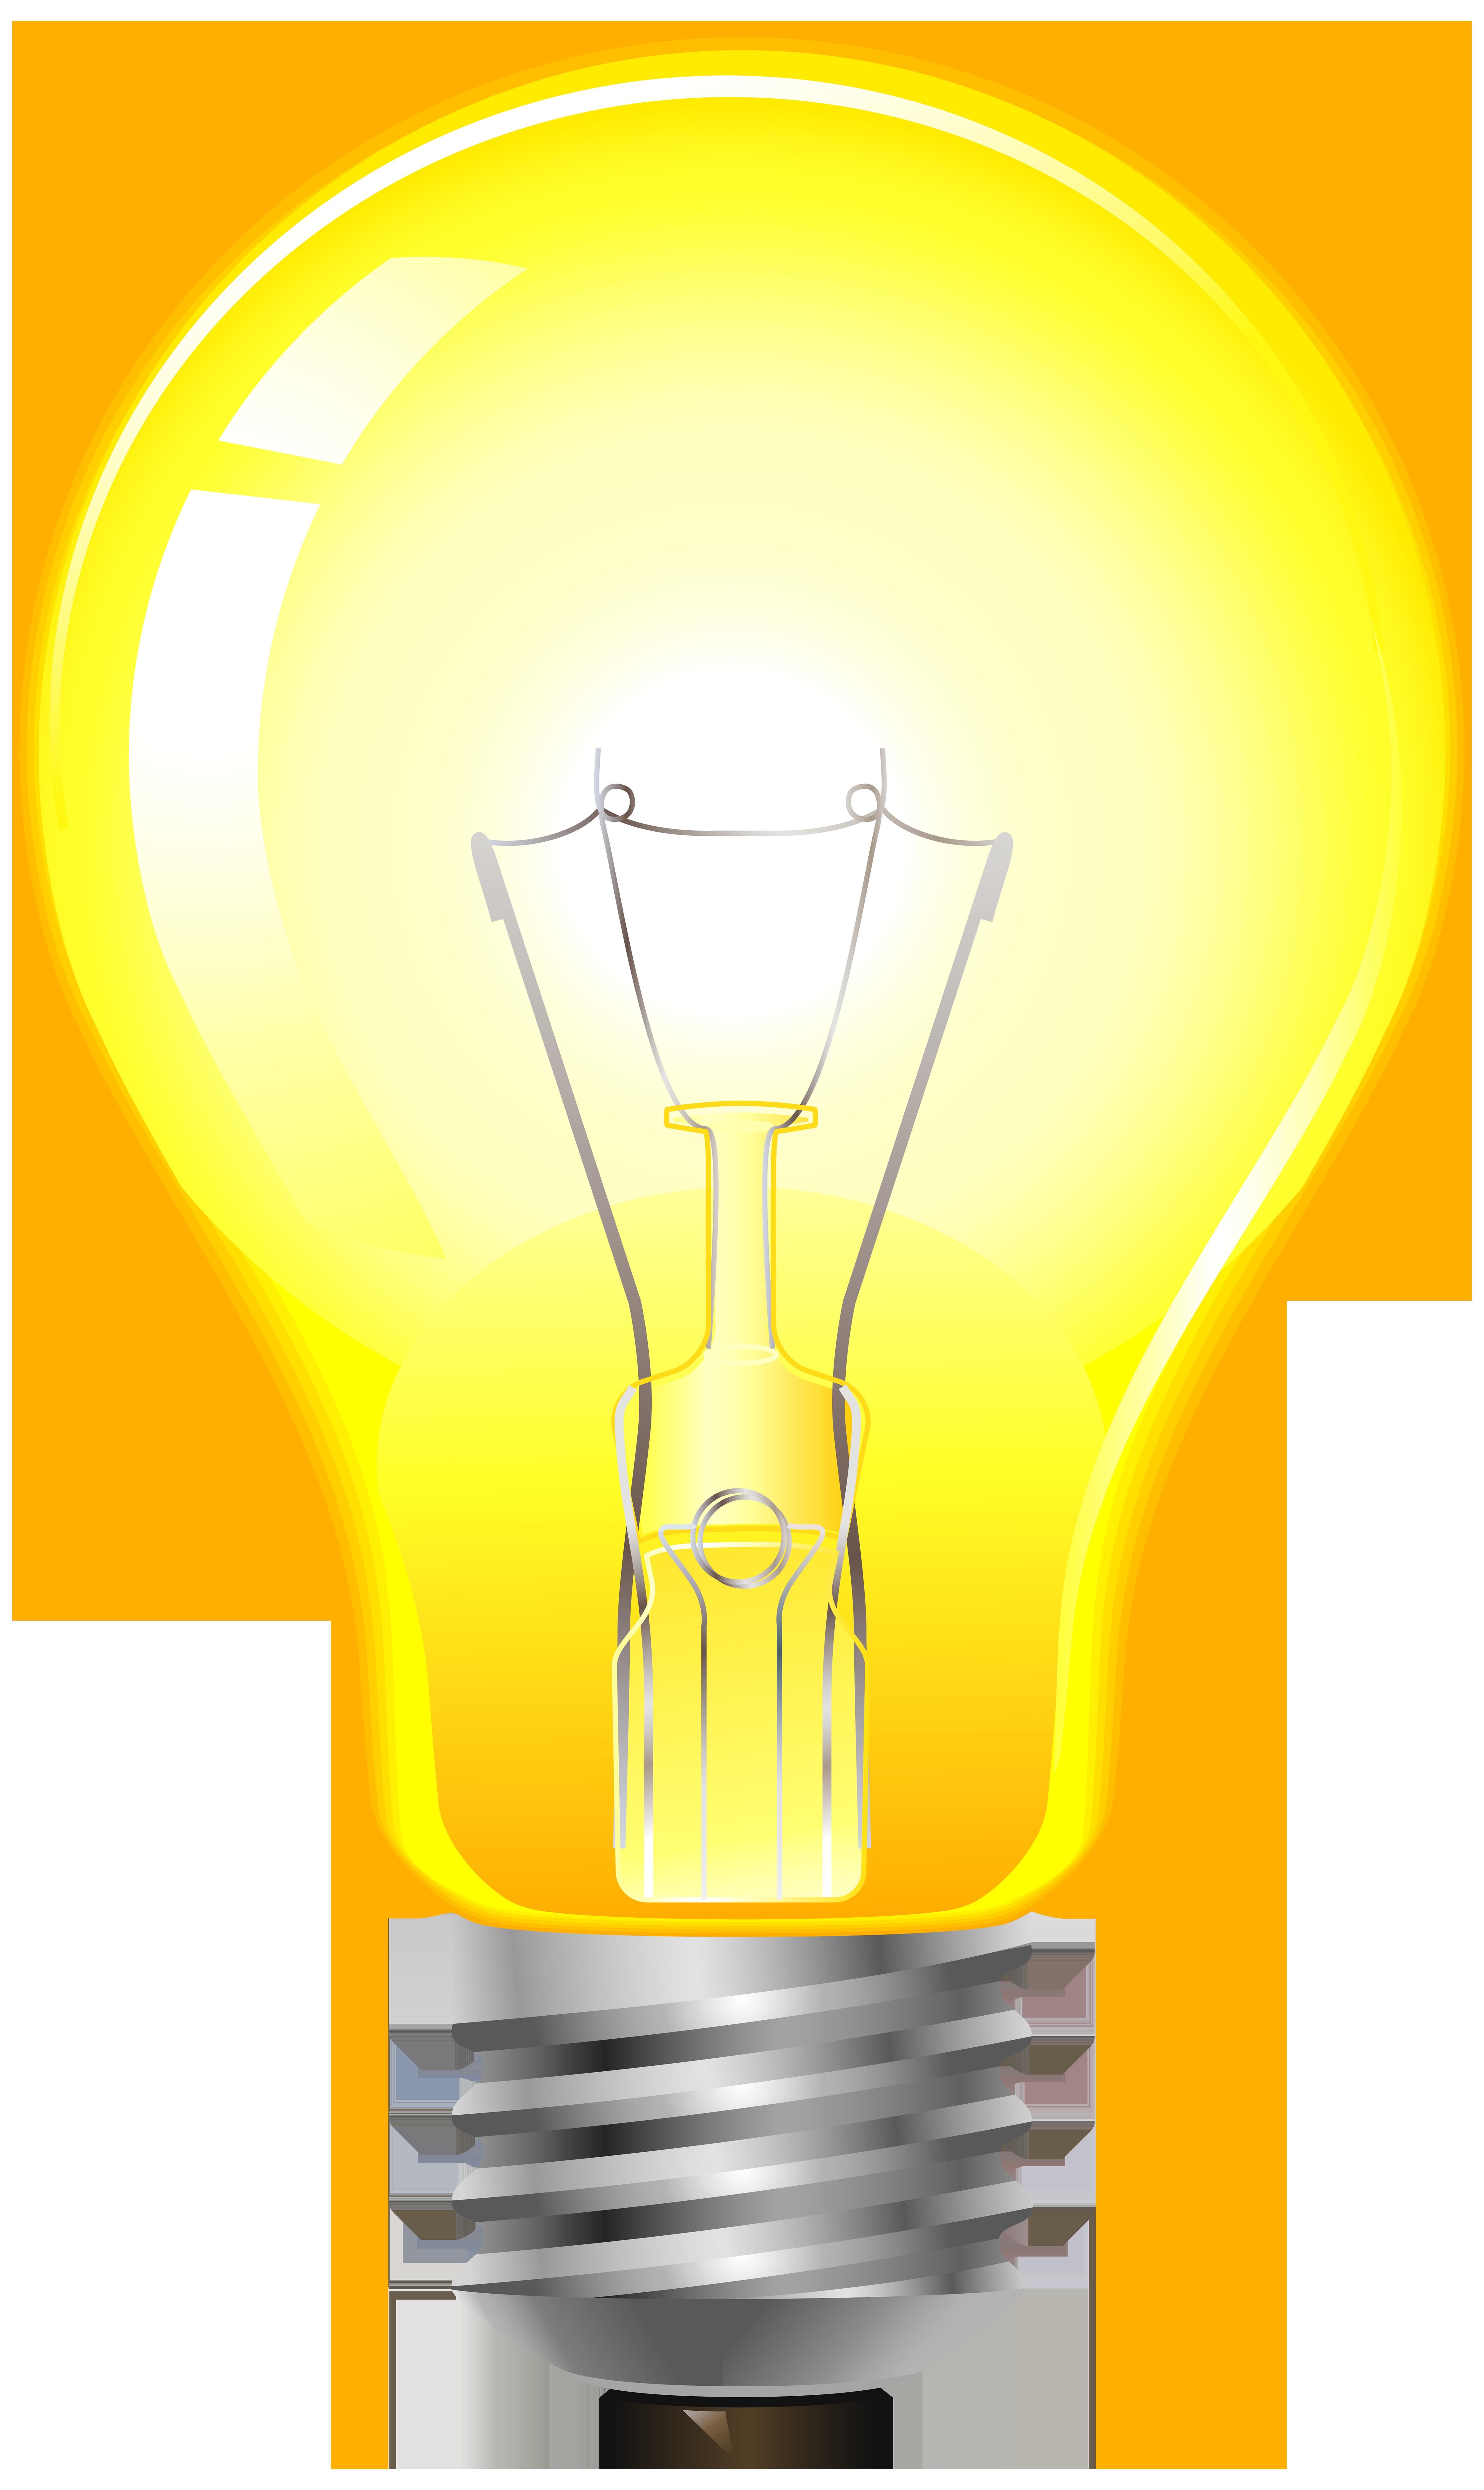 clip art royalty free stock Light clipart yellow. Bulb png clip art.